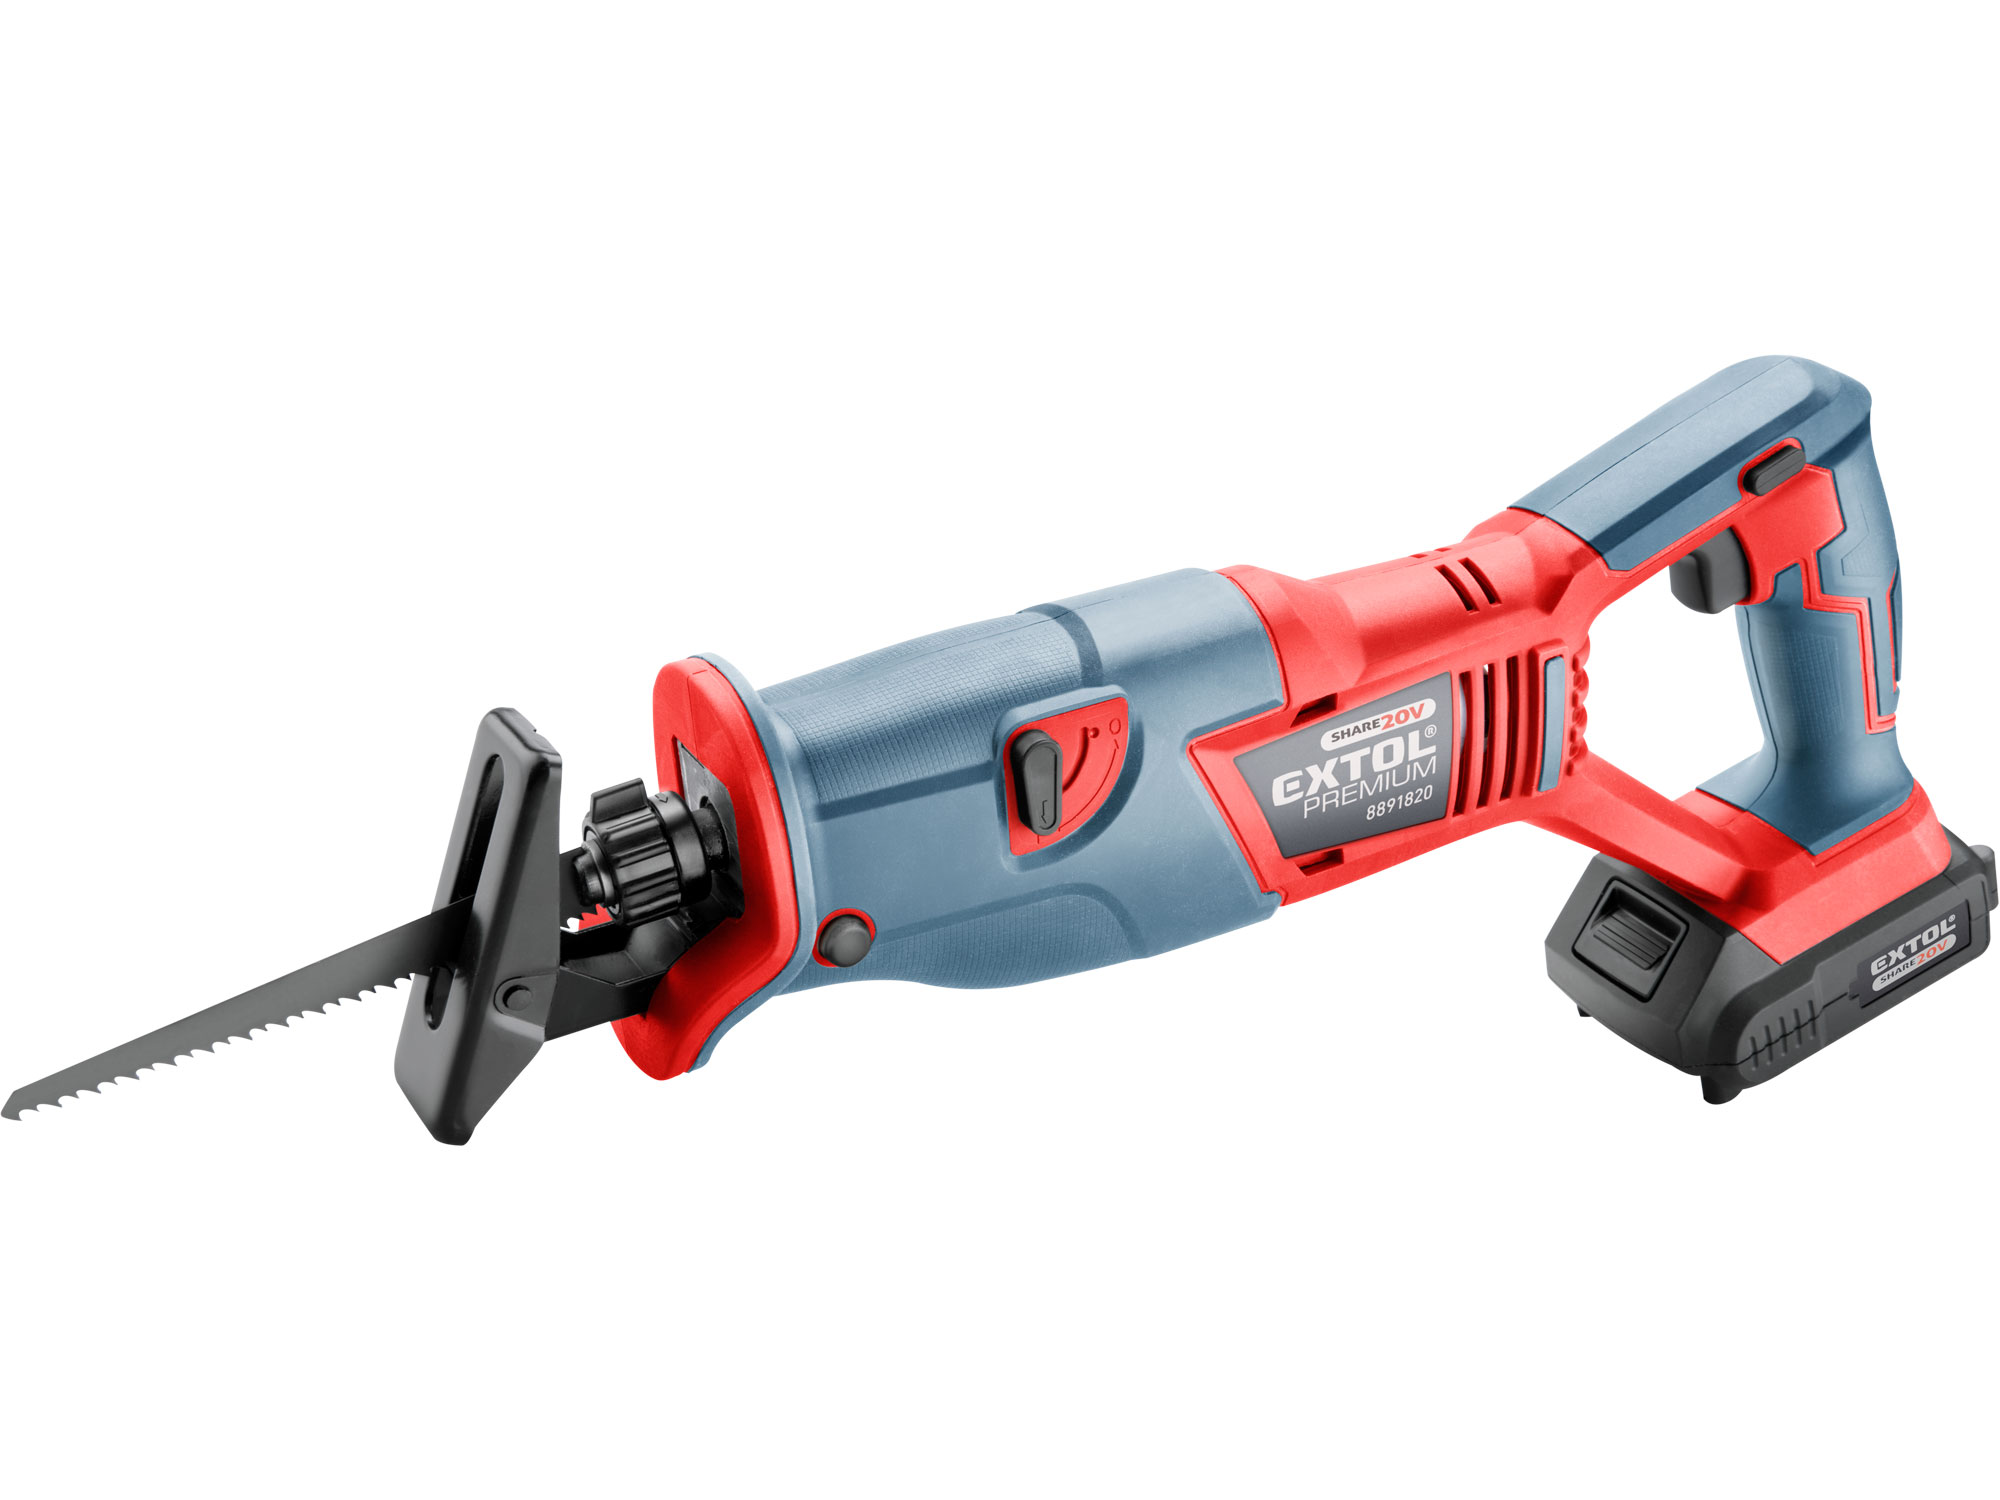 Cordless Reciprocating Saw, SHARE20V, 1x2000mAh Battery